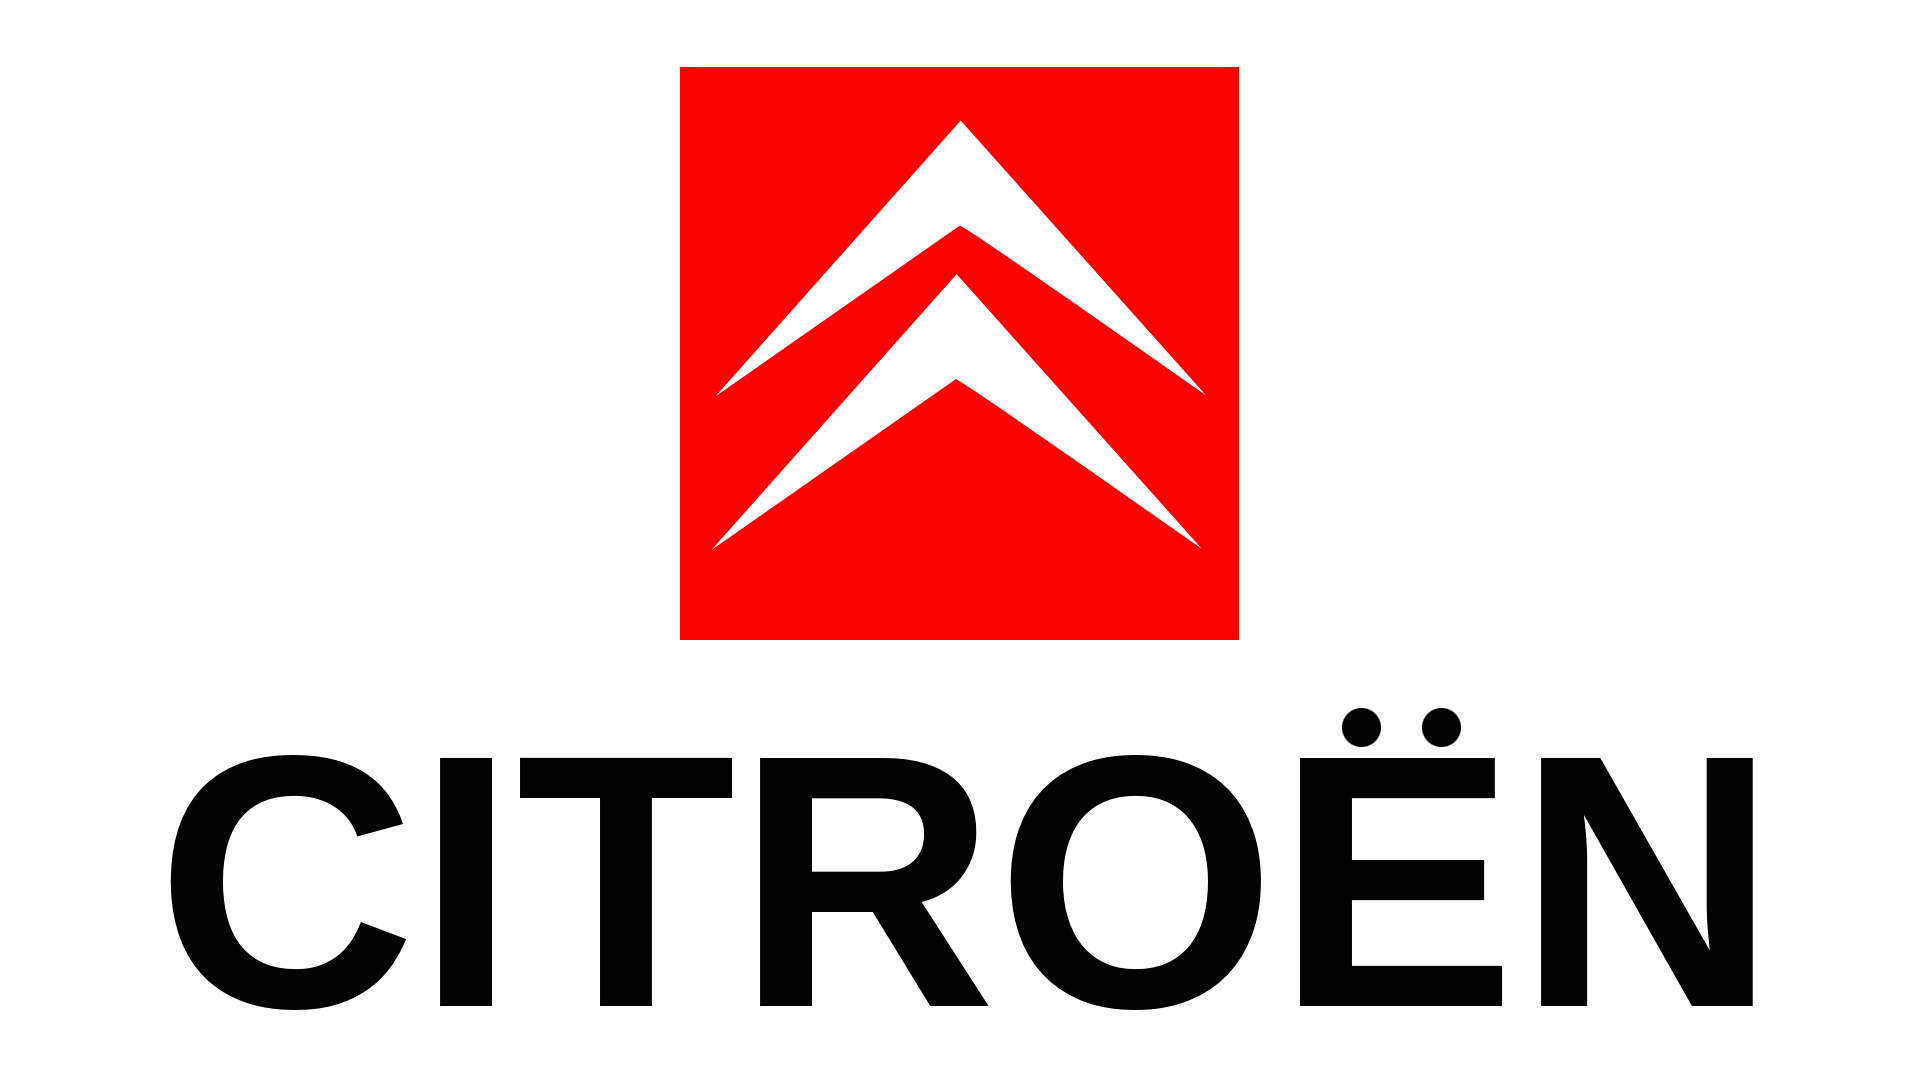 Big Explosion Png Png Image Purepng: Citroen Logo PNG Image - PurePNG